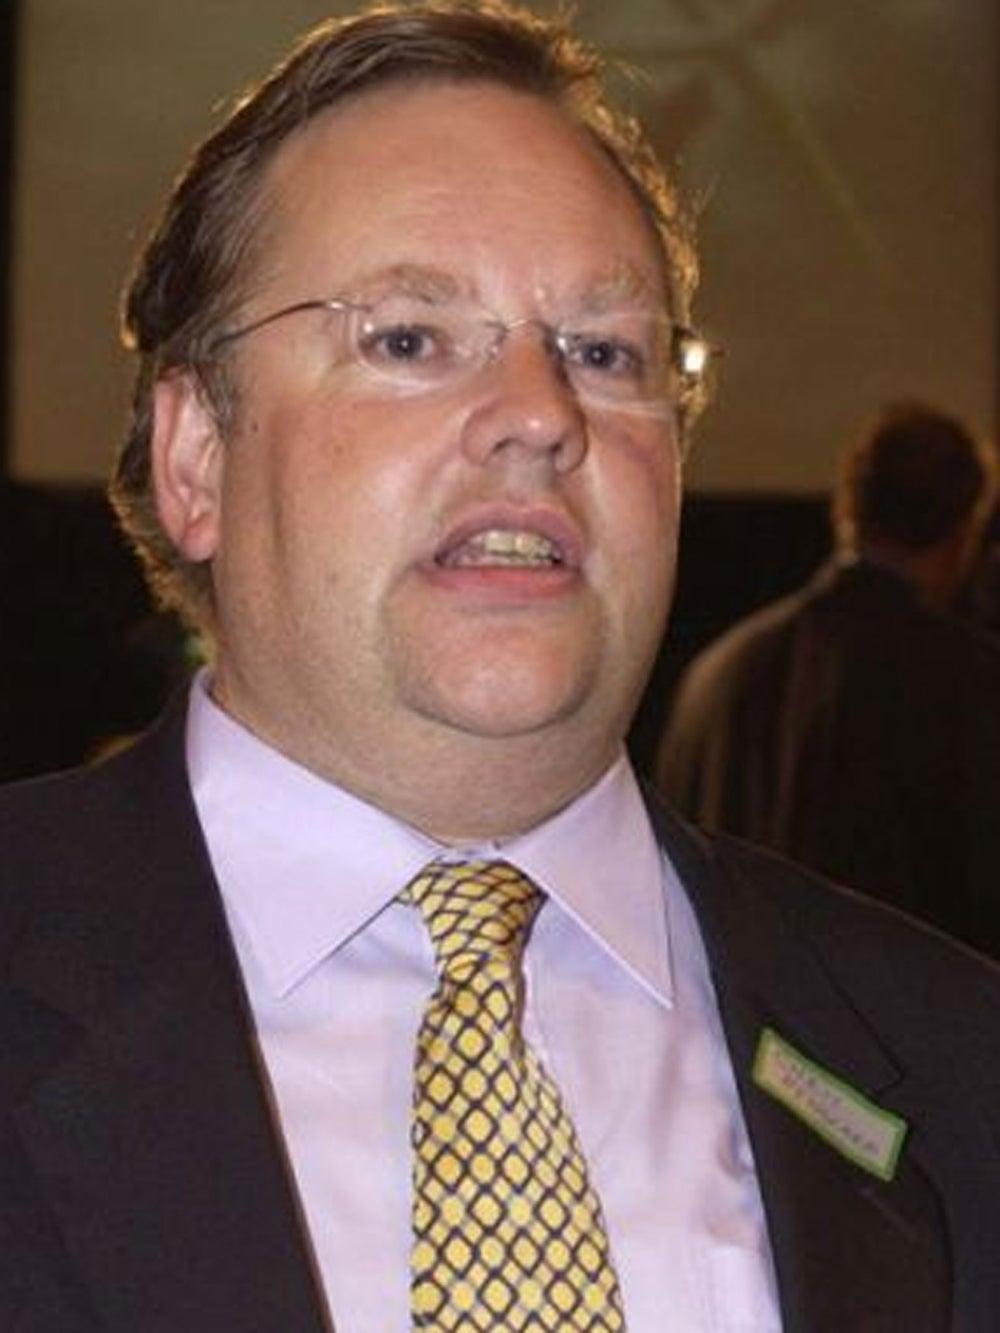 Chris Rennard, Baron Rennard